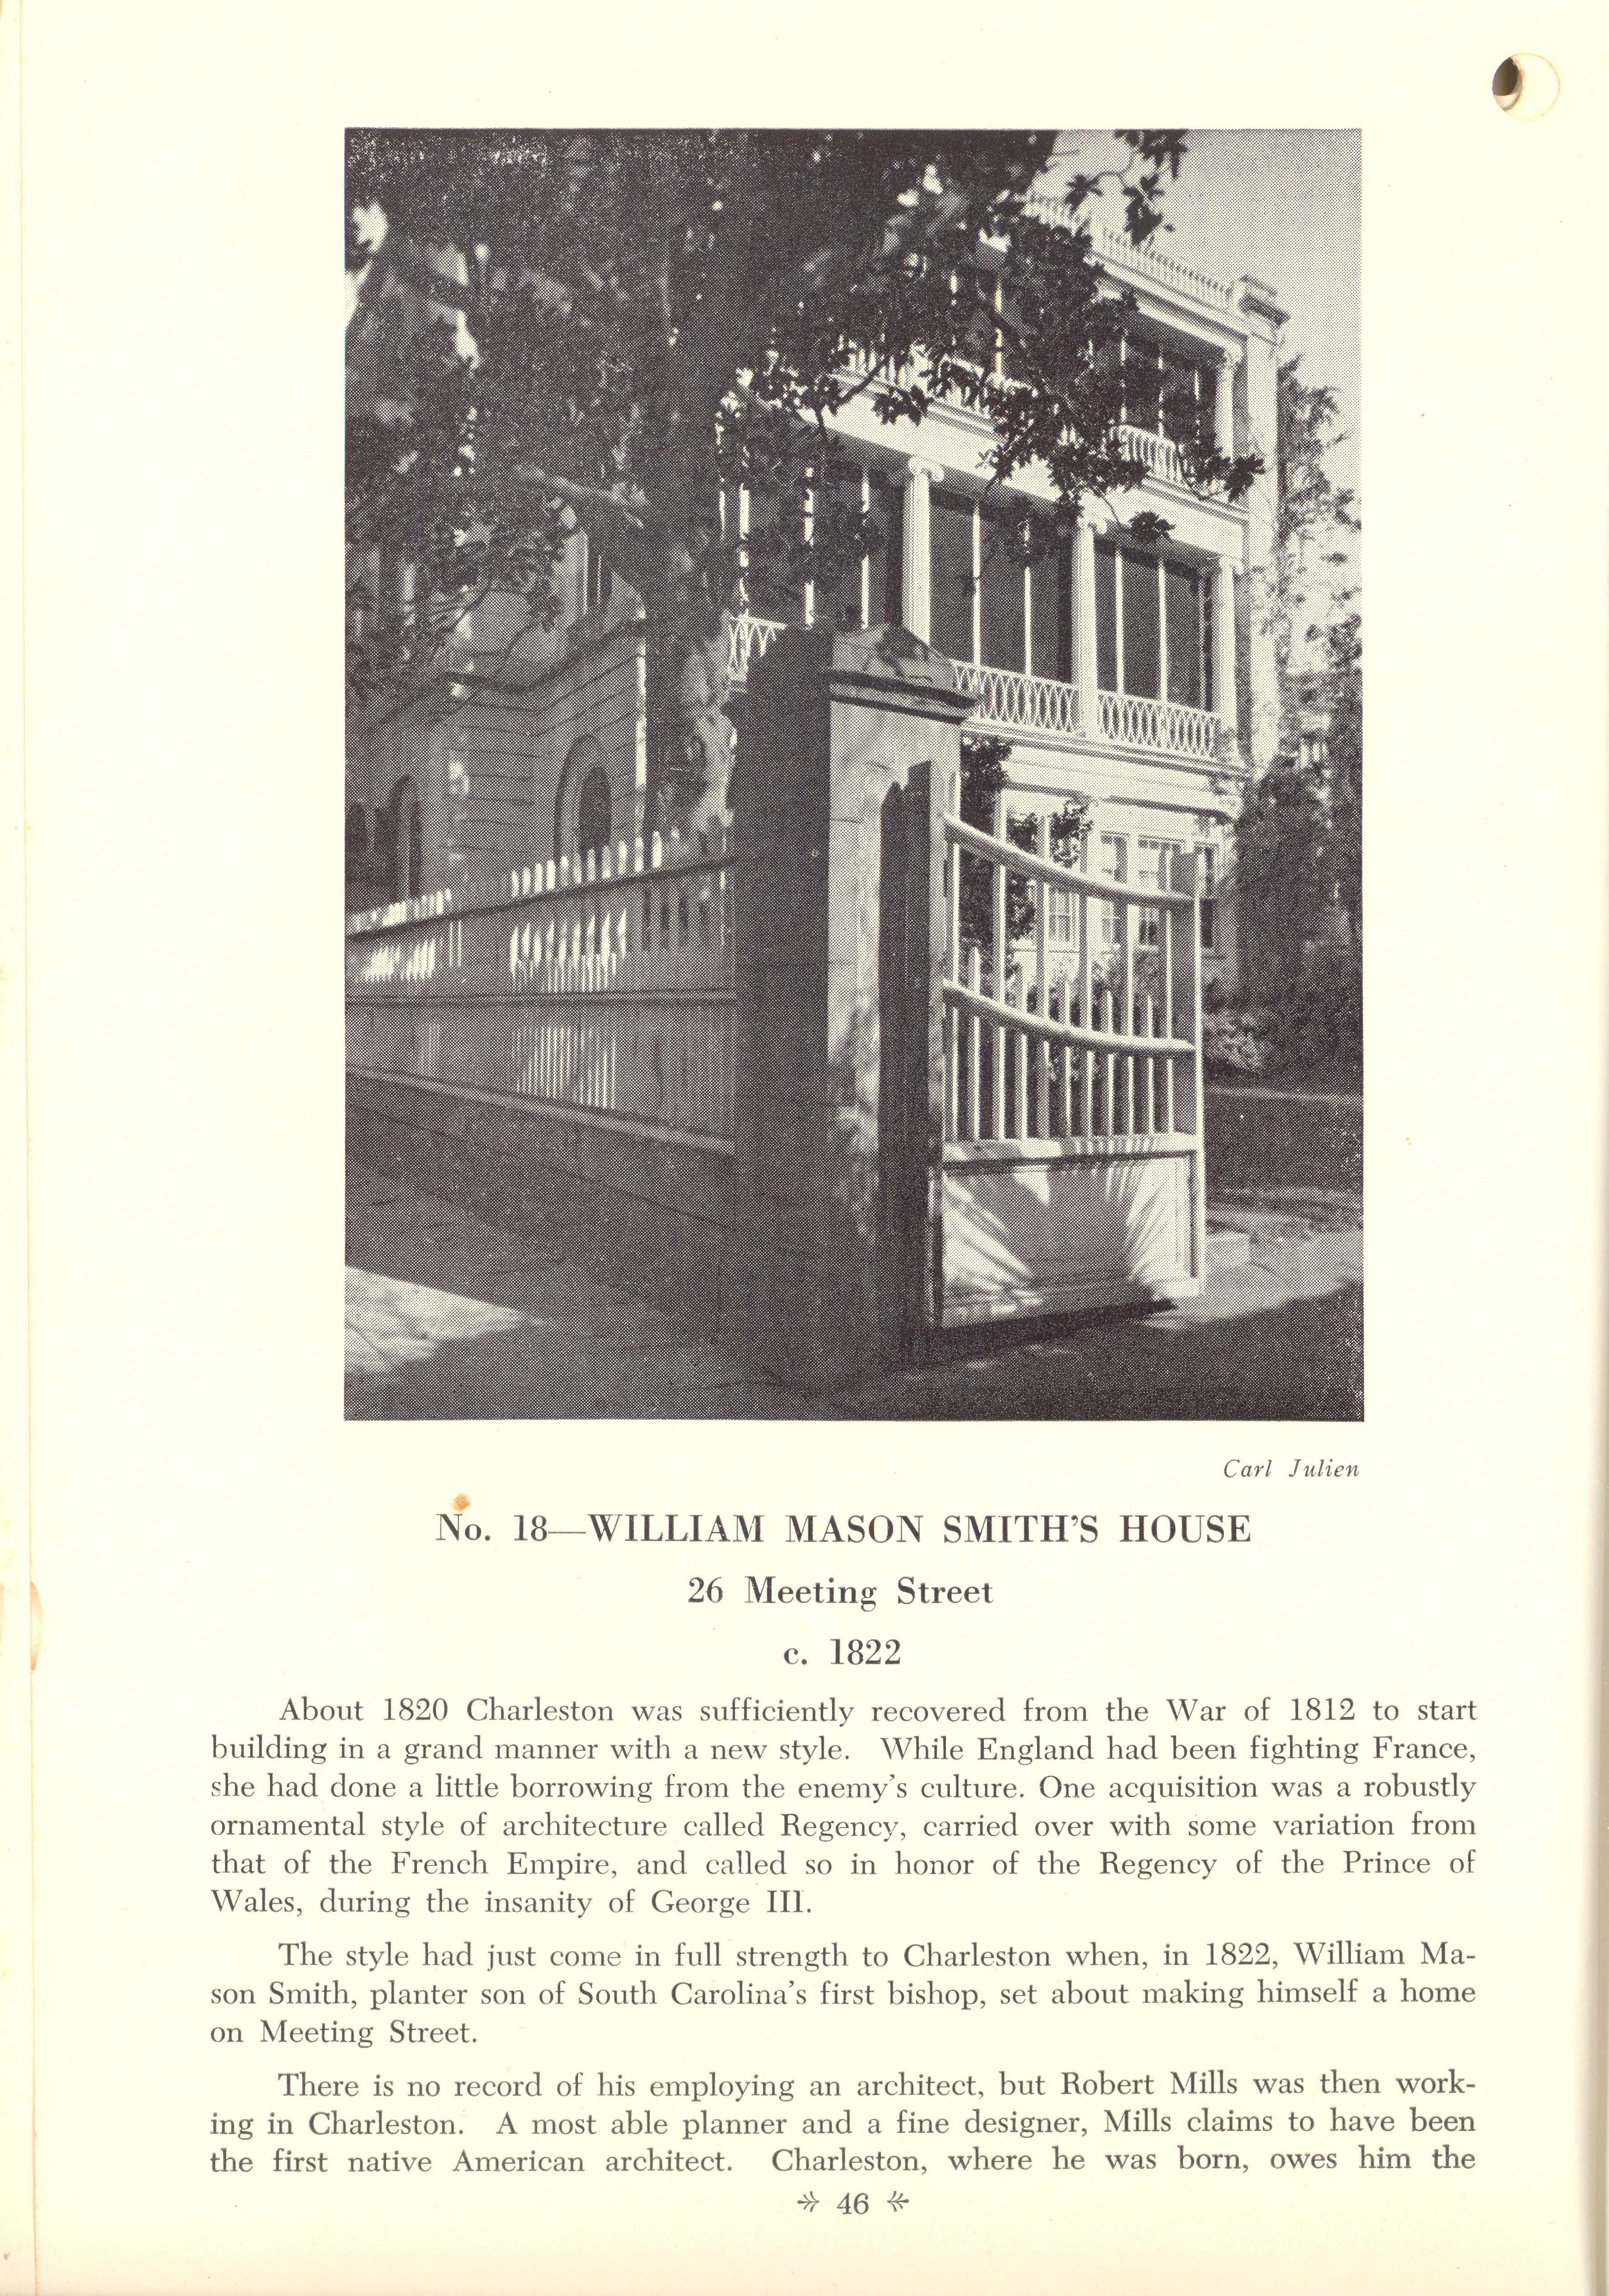 Page 46:  No. 18 - William Mason Smith's House, 26 Meeting Street, c. 1822